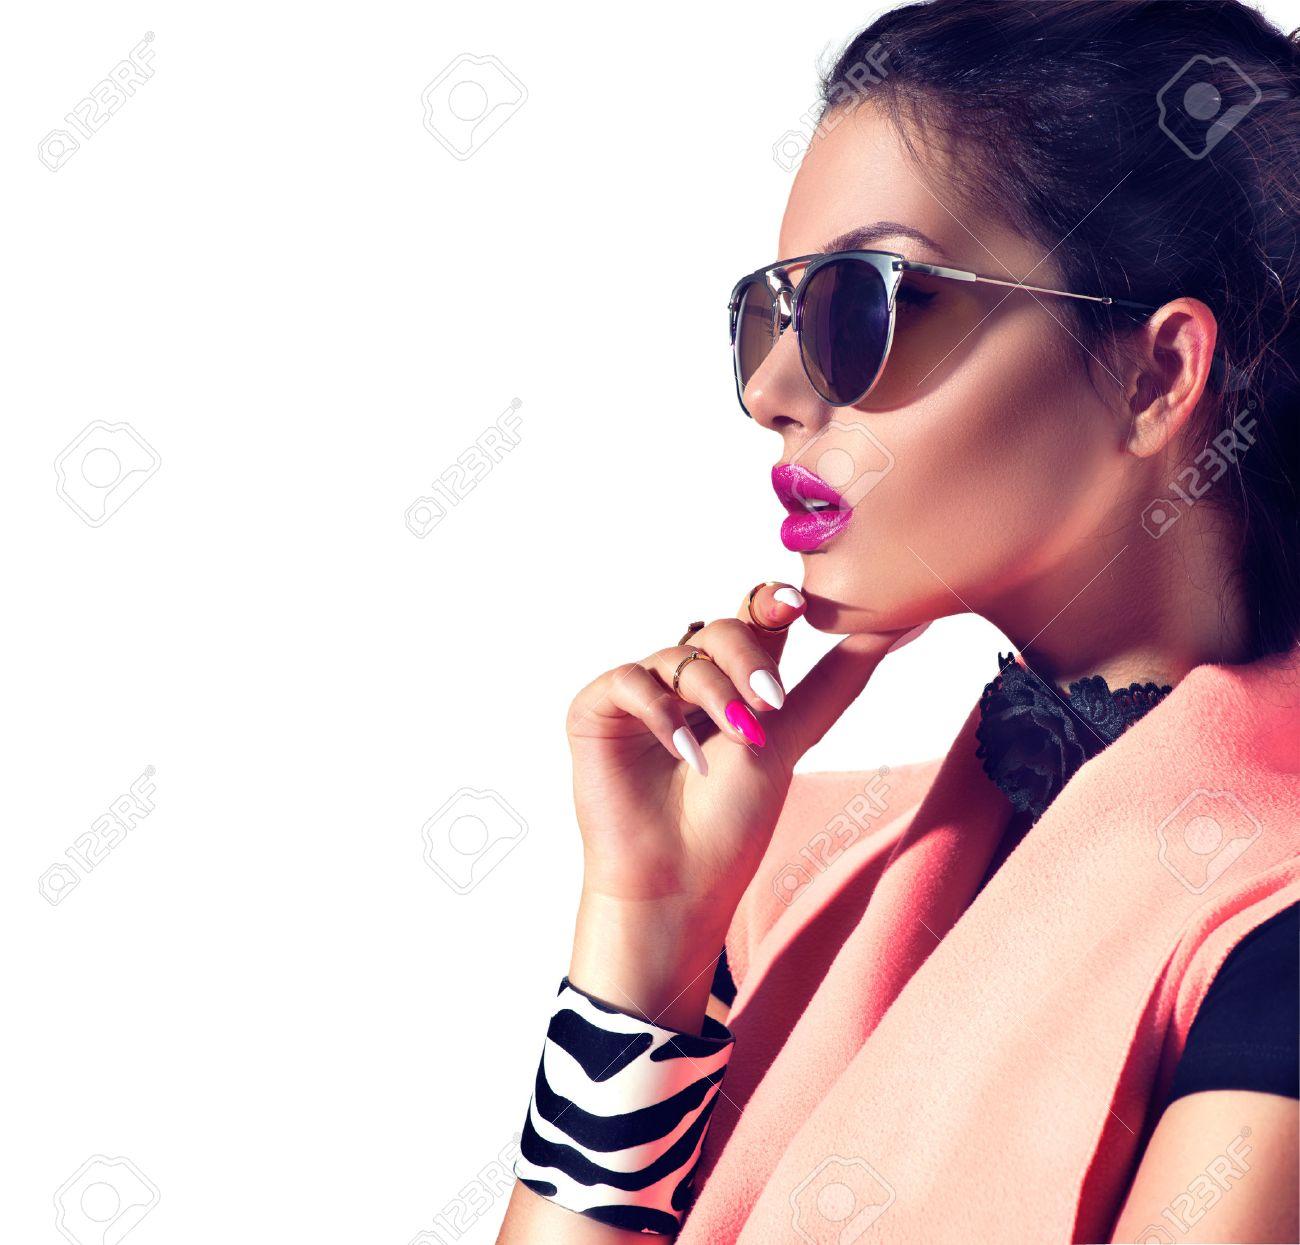 Beauty fashion brunette model girl wearing stylish sunglasses Banque d'images - 63997810